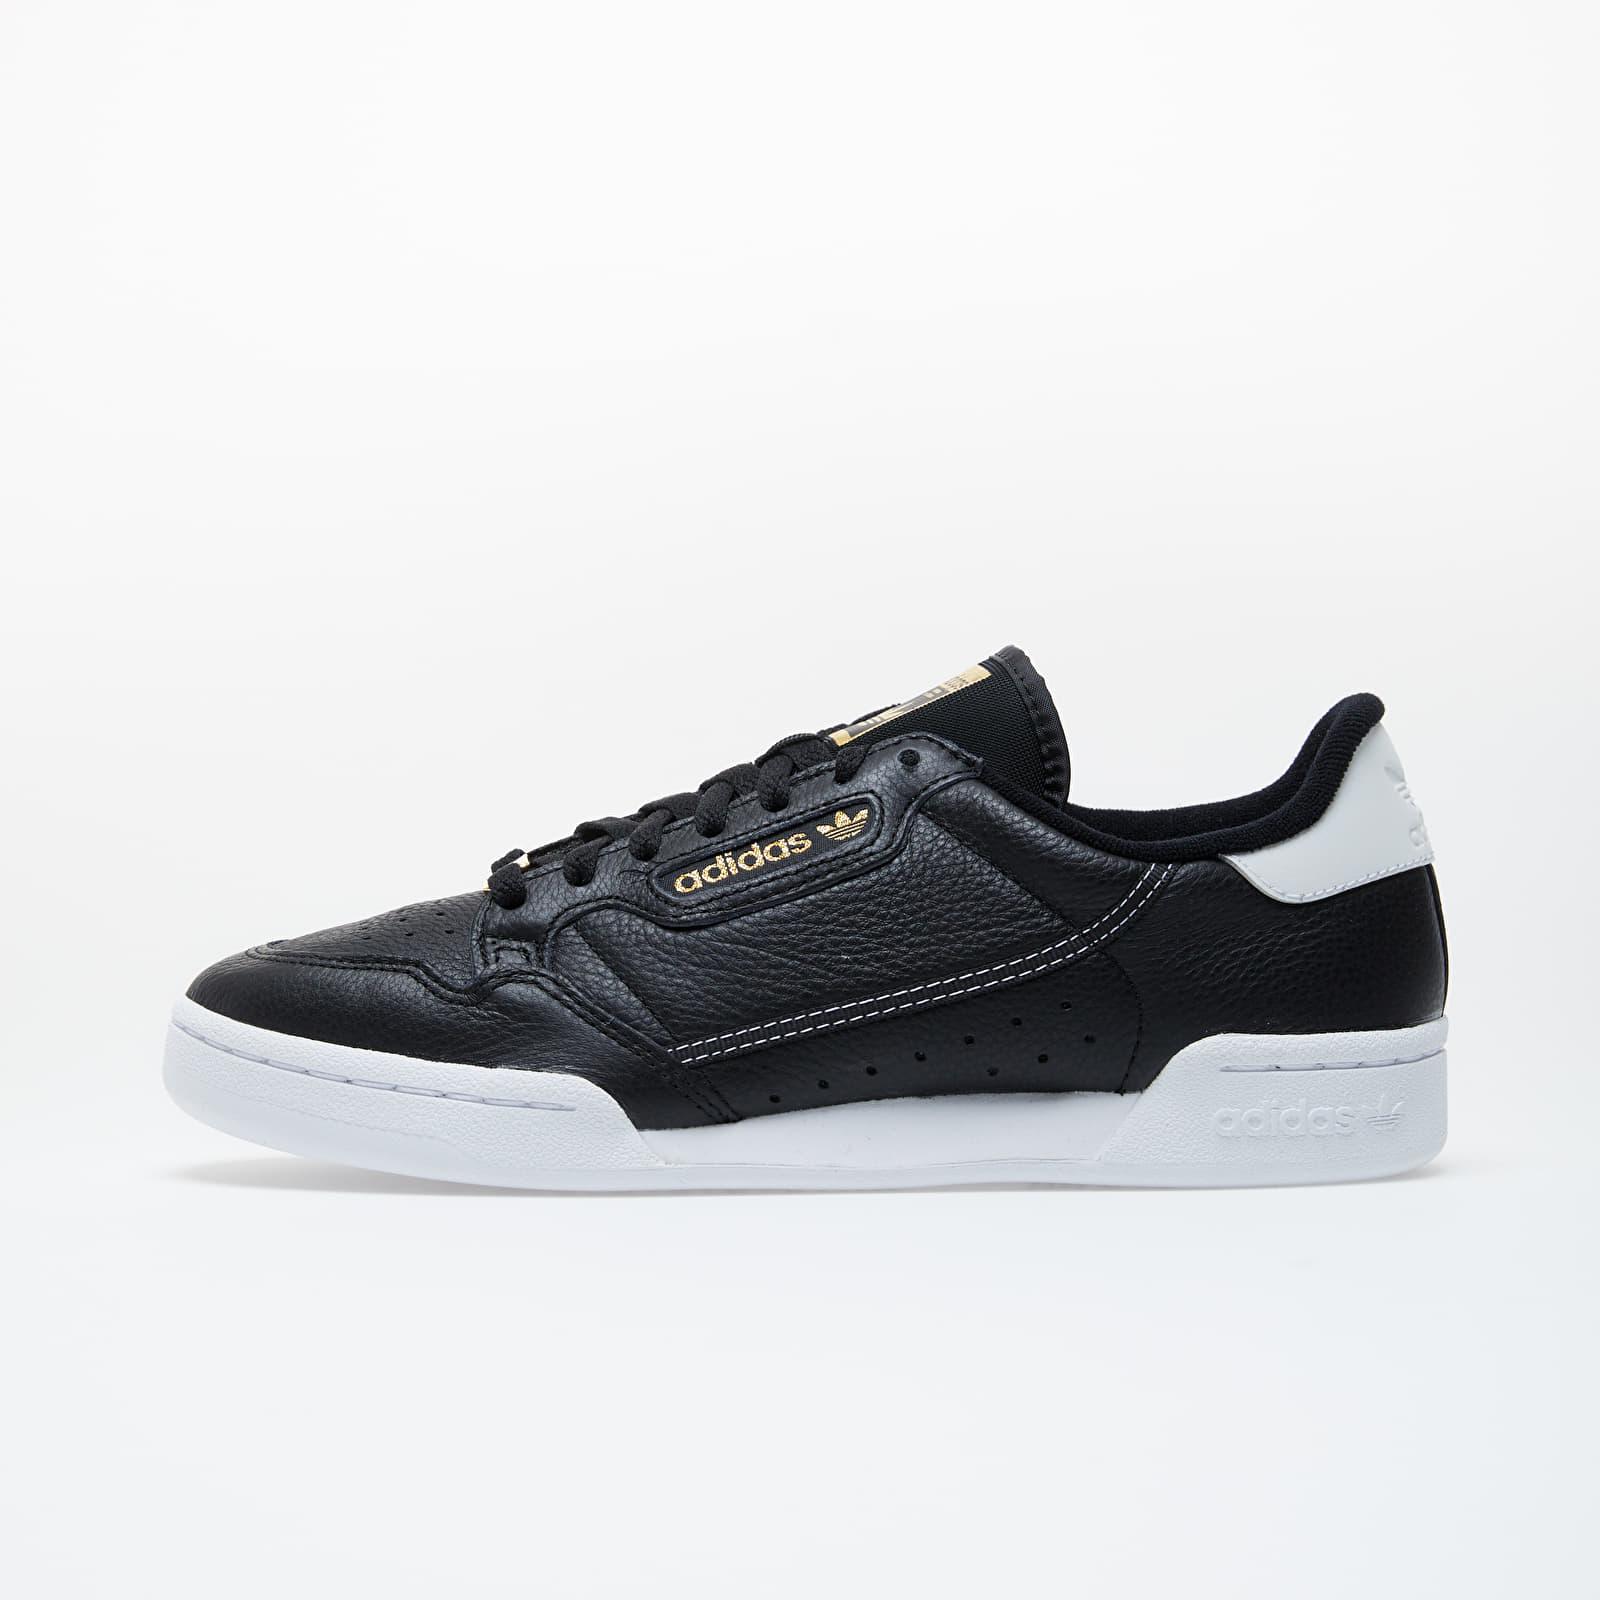 Férfi cipők adidas Continental 80 Core Black/ Core Black/ Ftw White